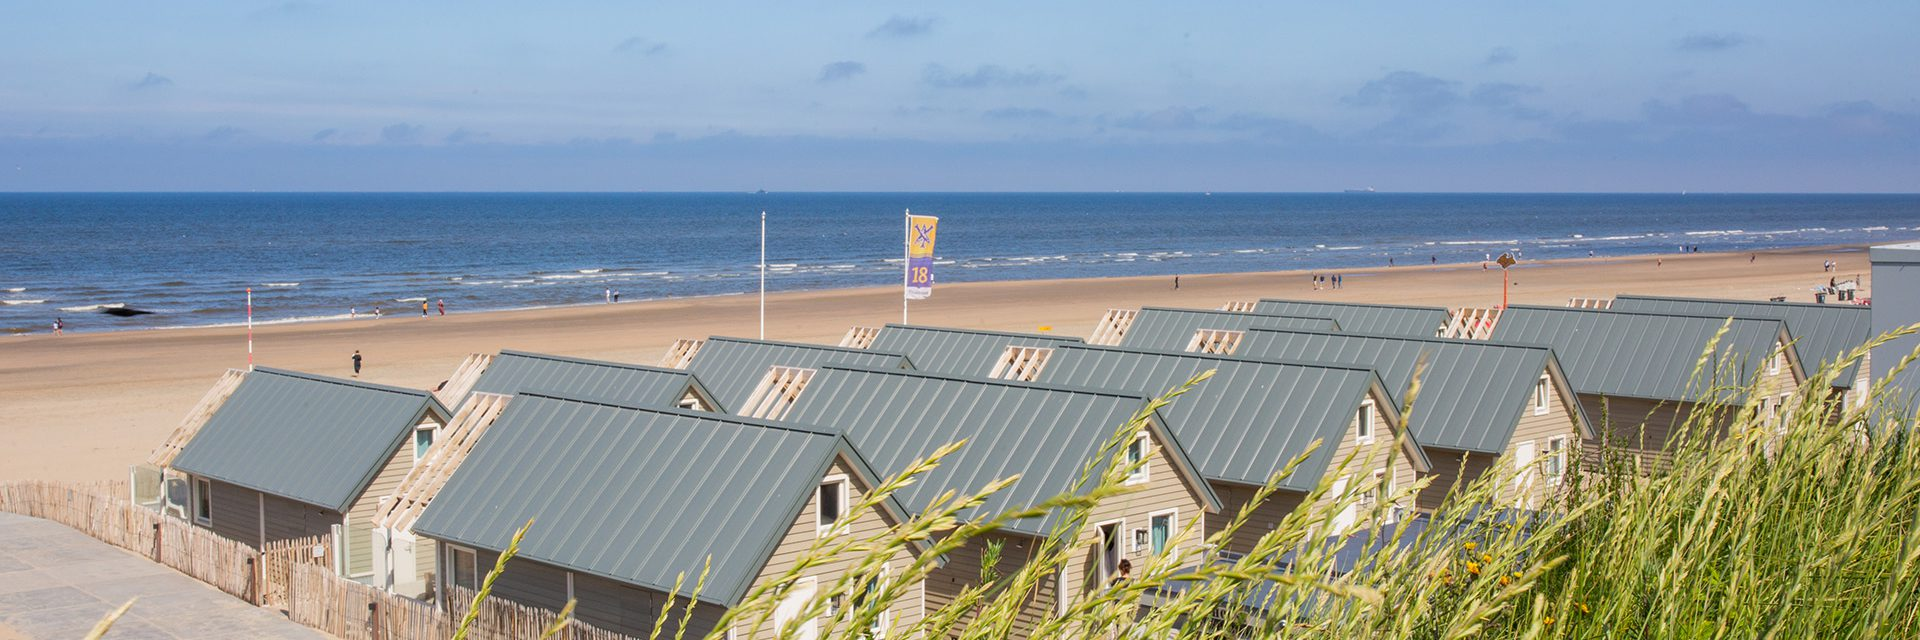 Thalassa Beachhouse - strand Zandvoort